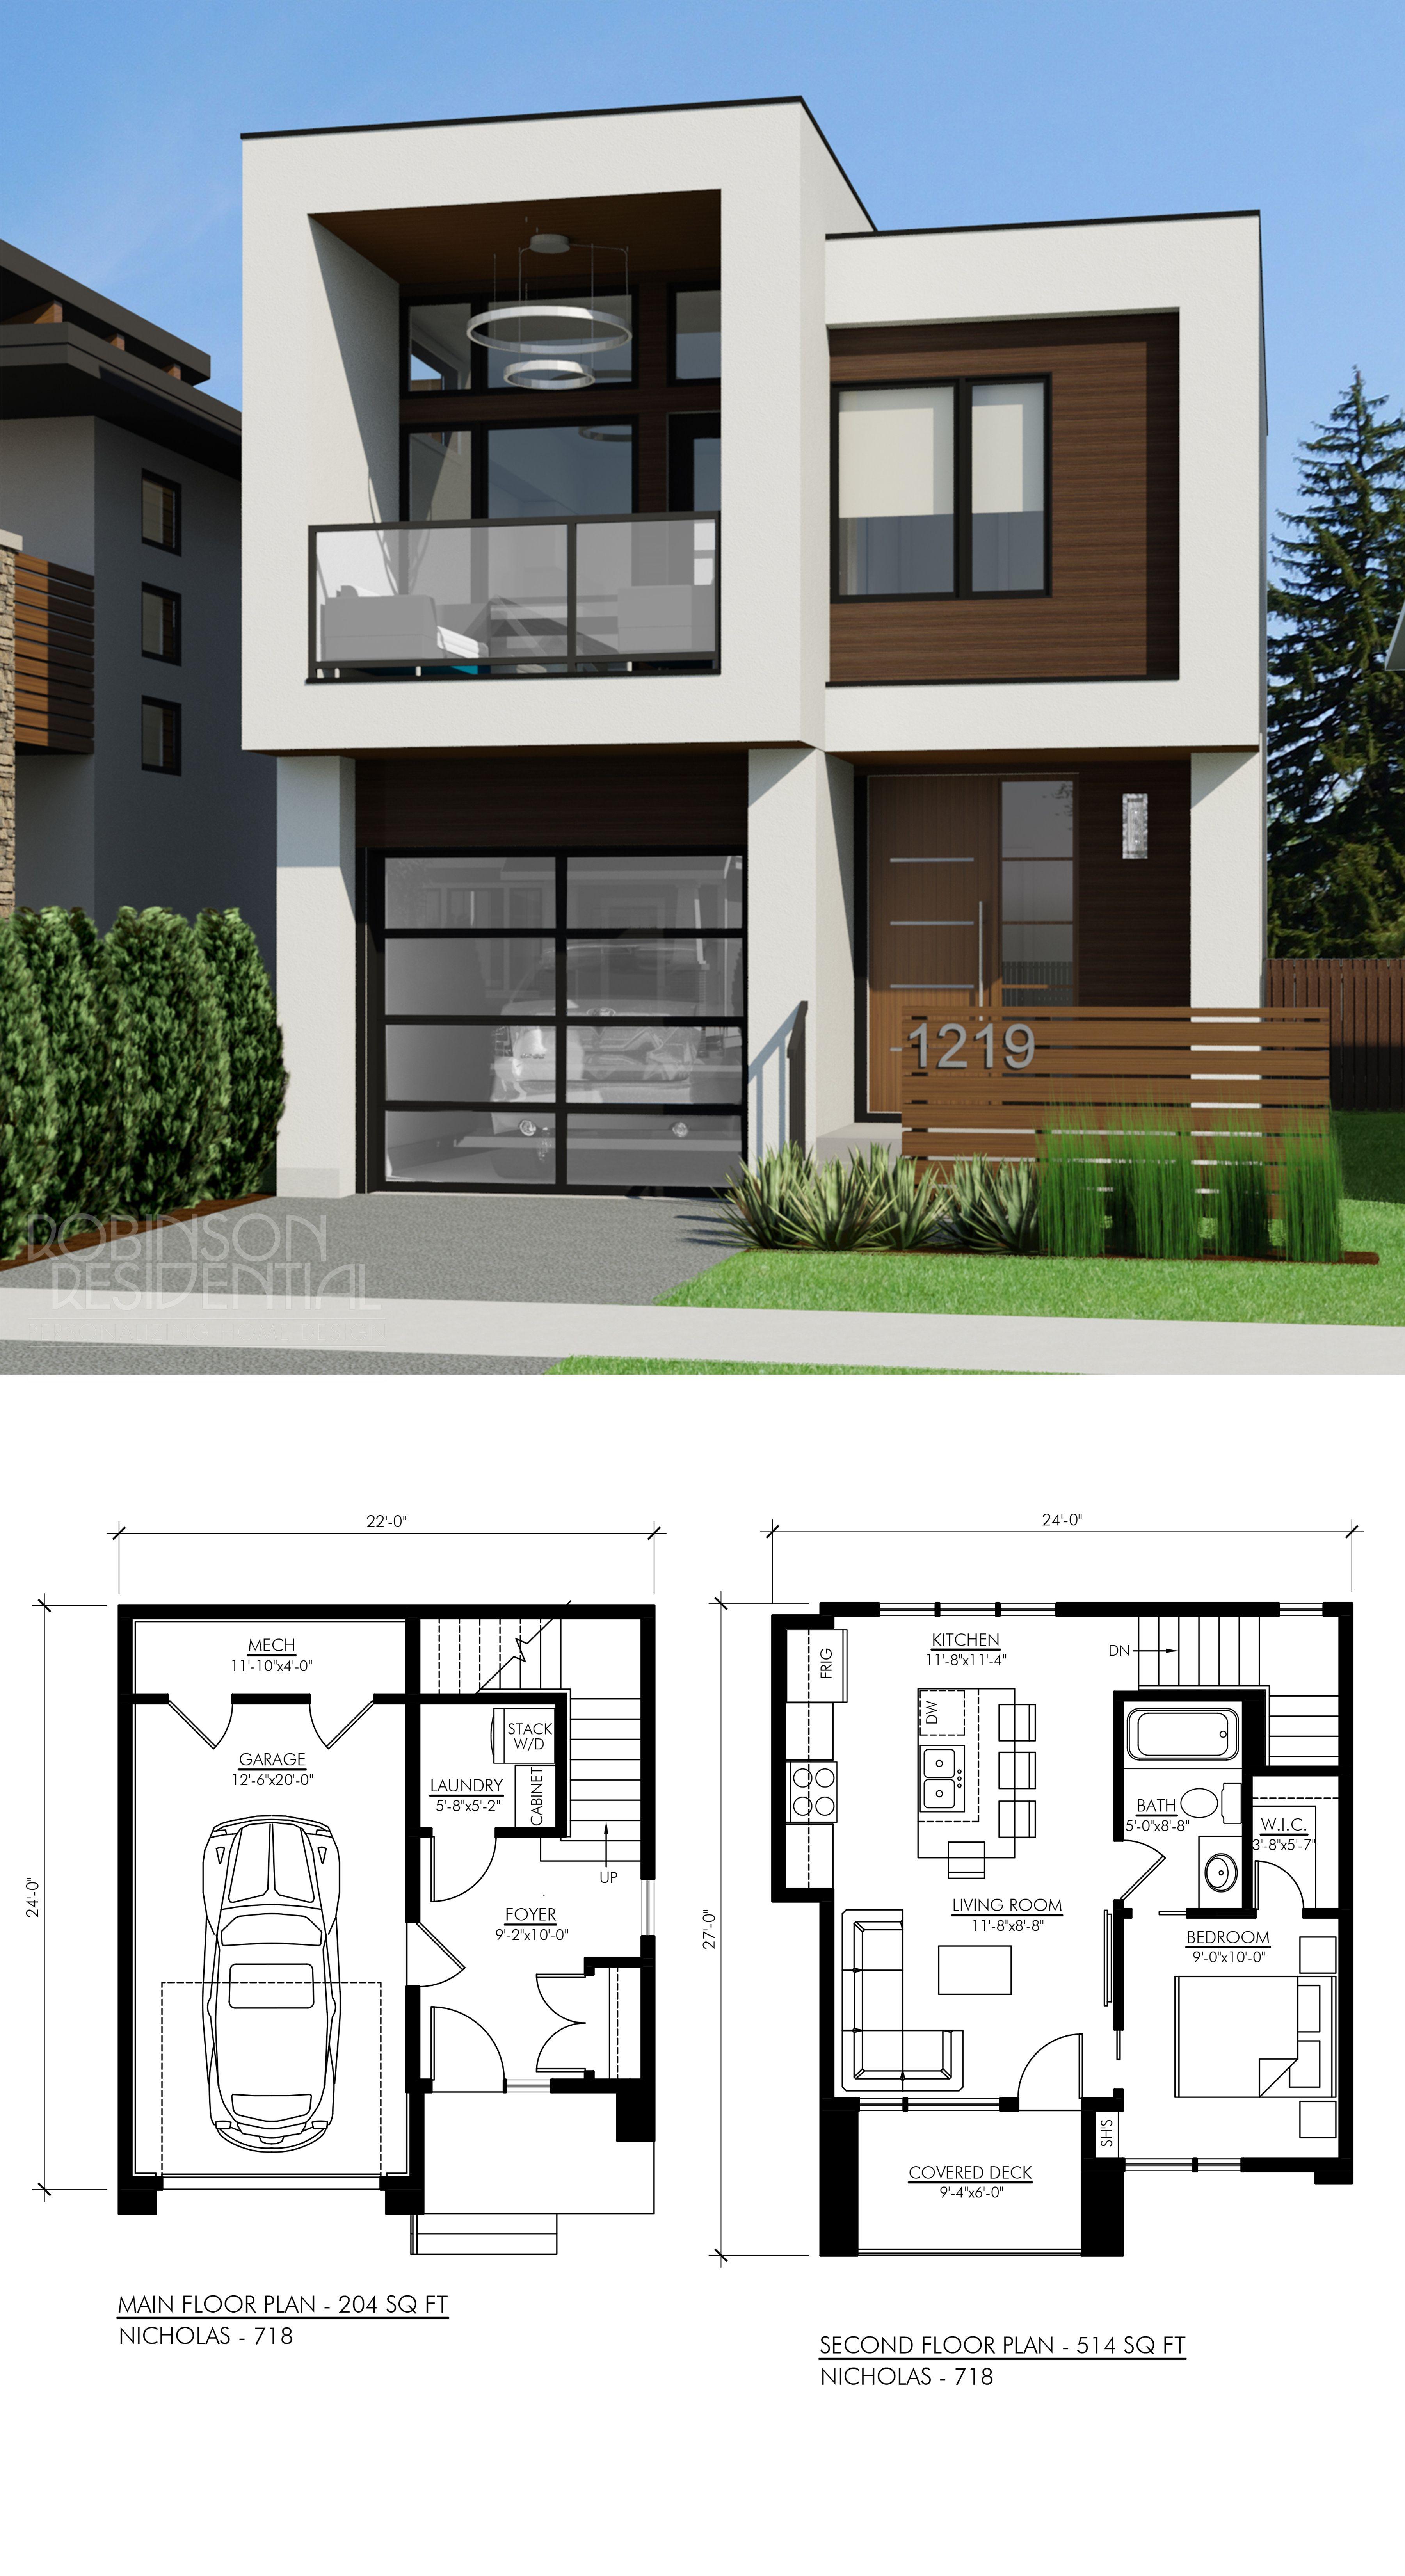 Contemporary Nicholas 718 Minimalist House Design House Designs Exterior Contemporary House Plans